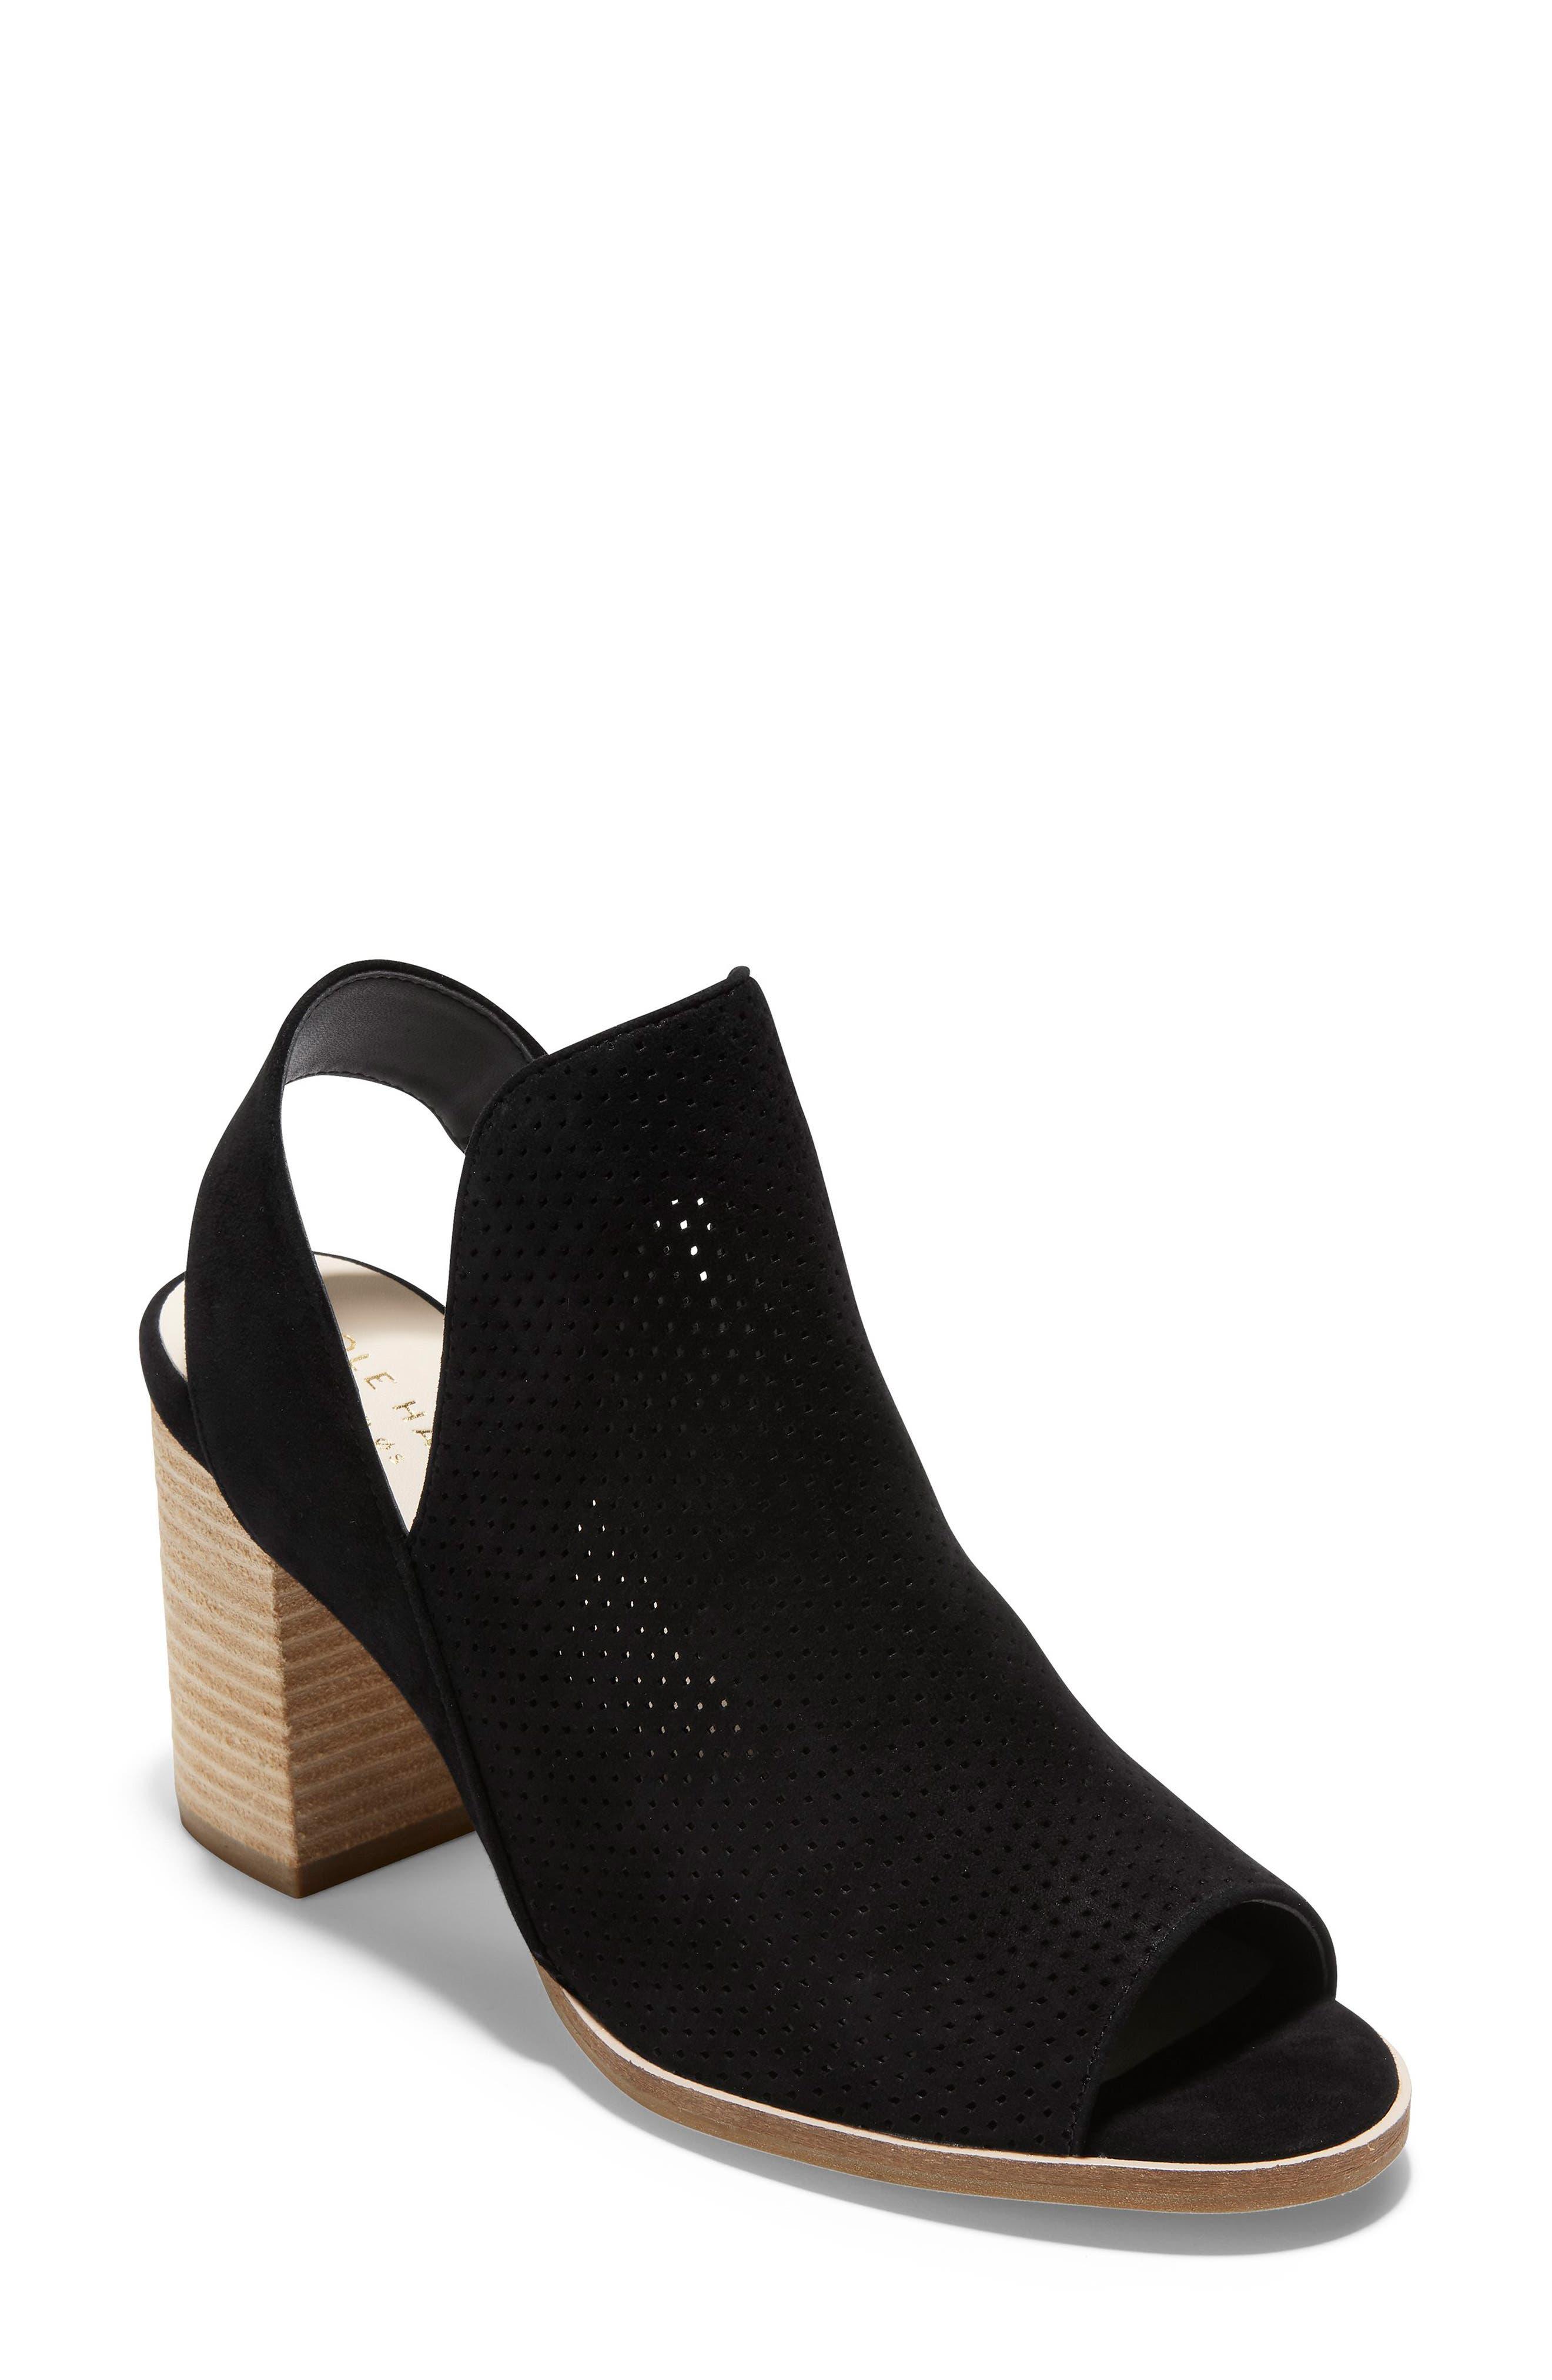 Callista Perforated Slingback Sandal, Main, color, BLACK PERF SUEDE